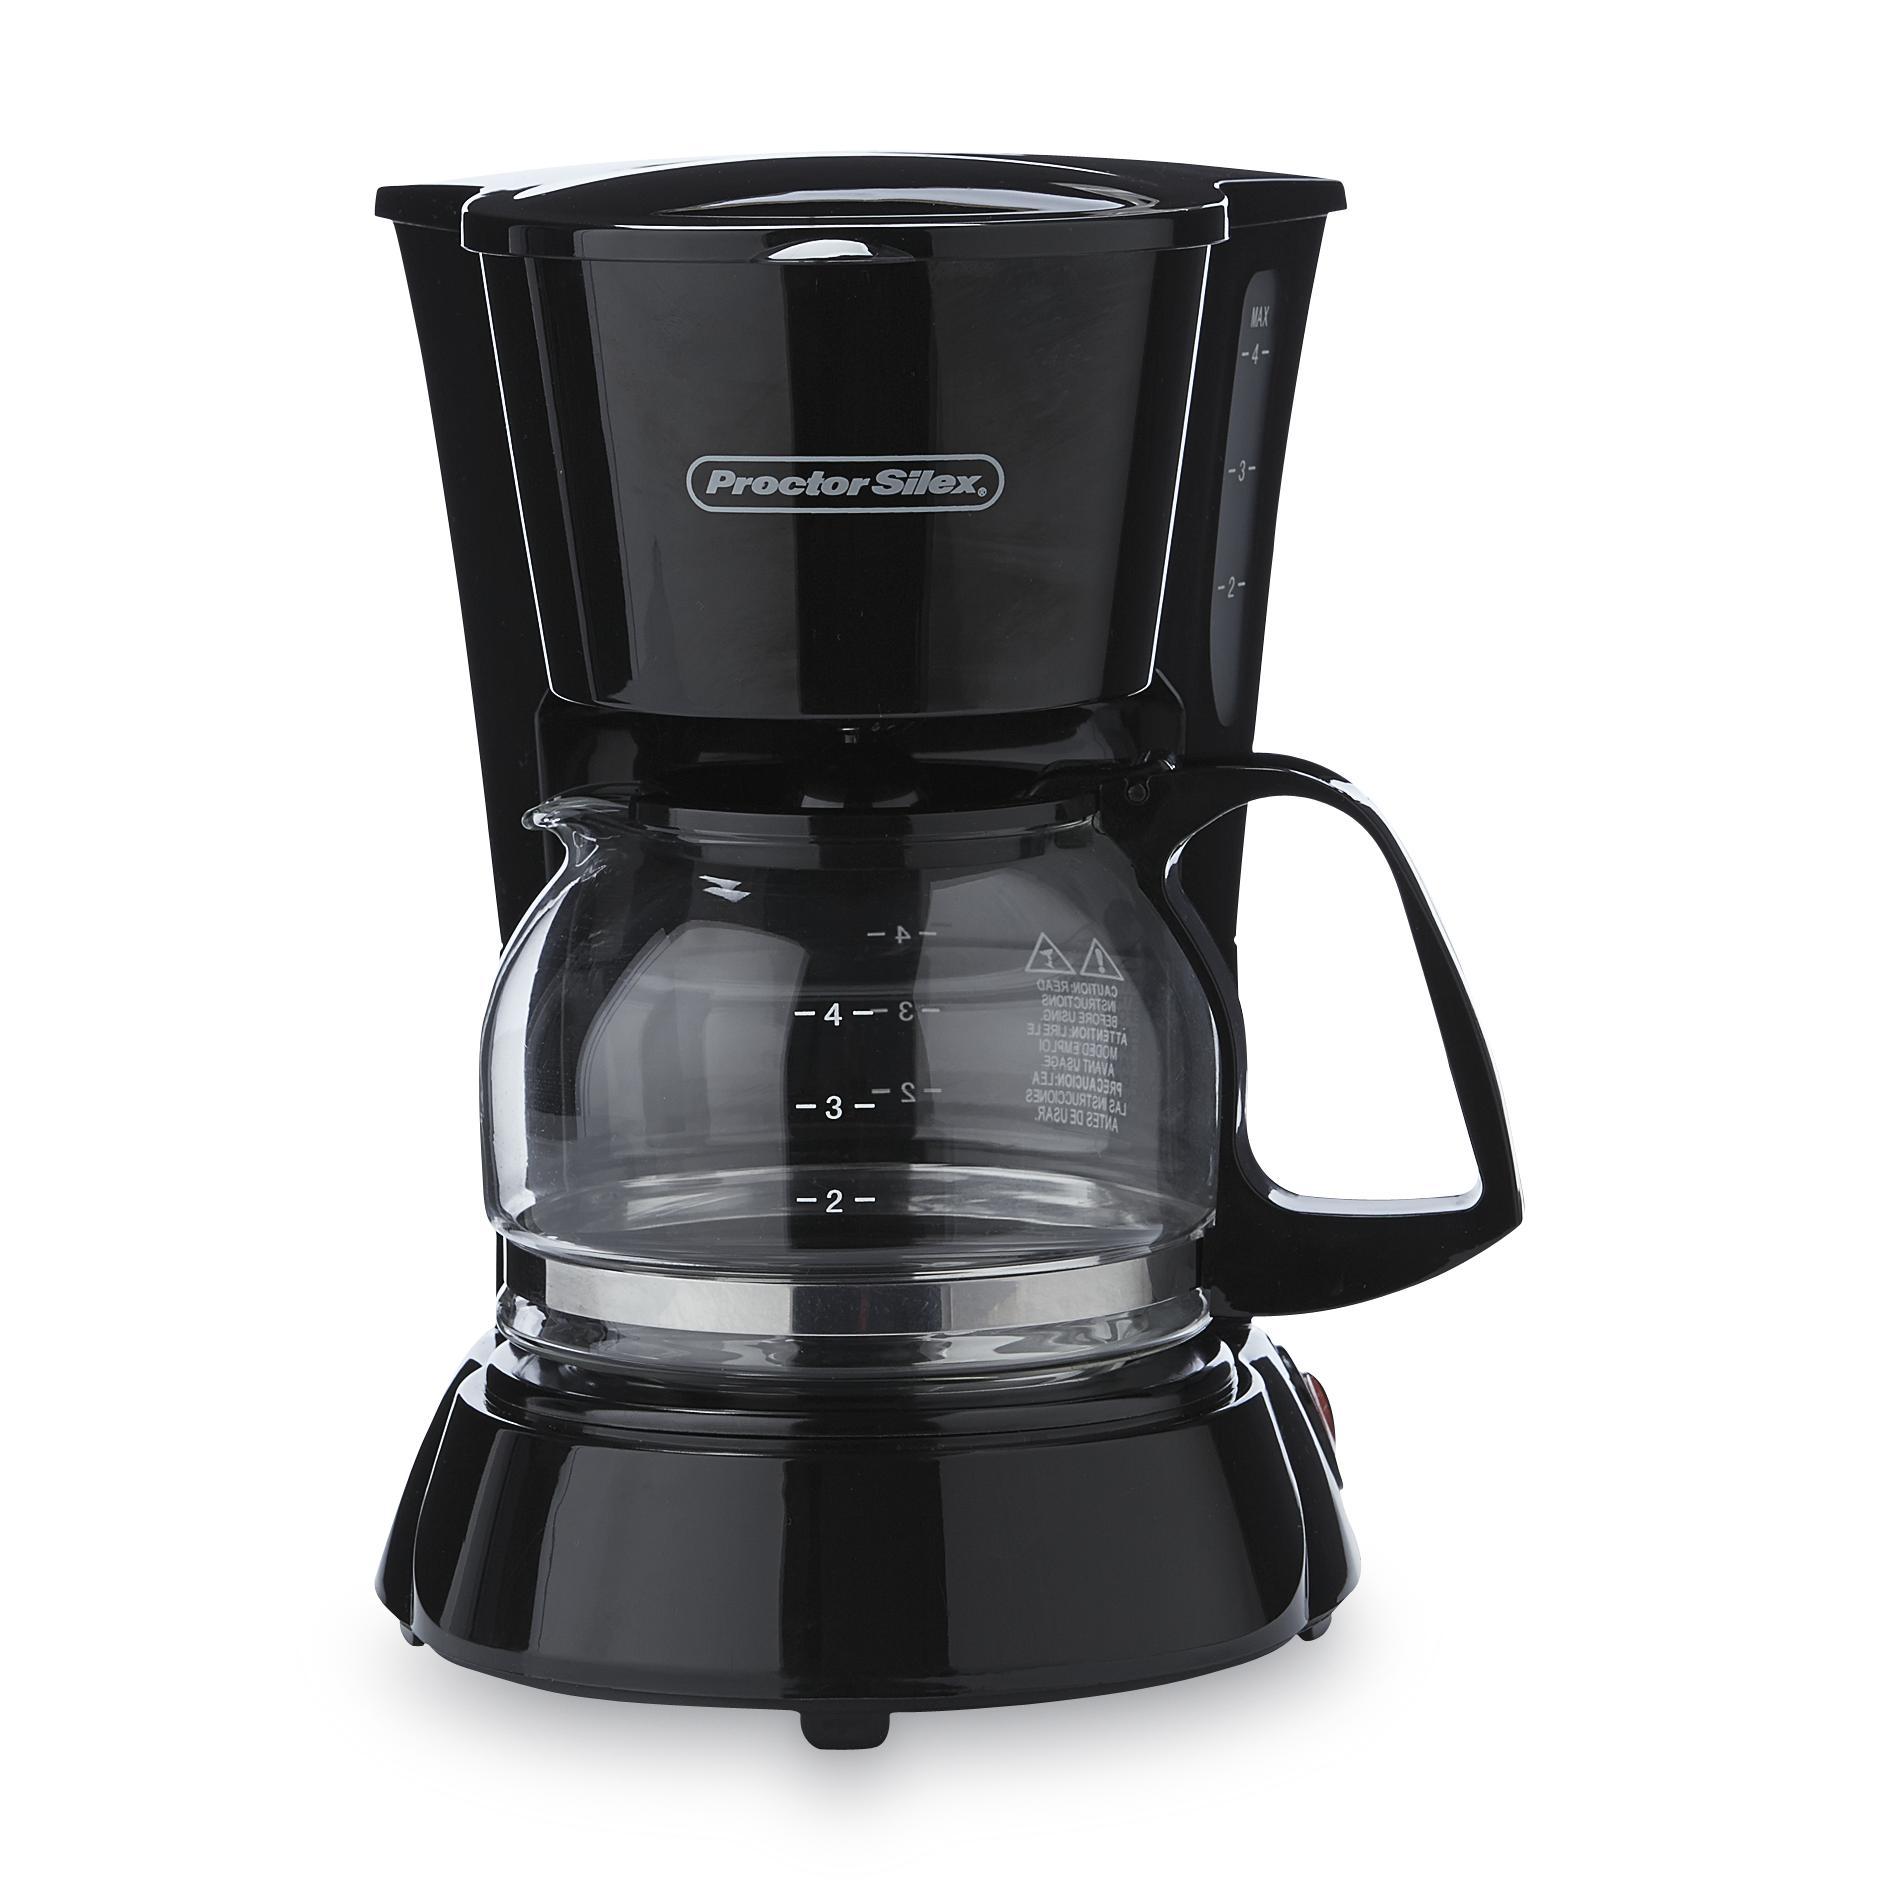 Proctor Silex 48138 4-cup Coffee Maker Black